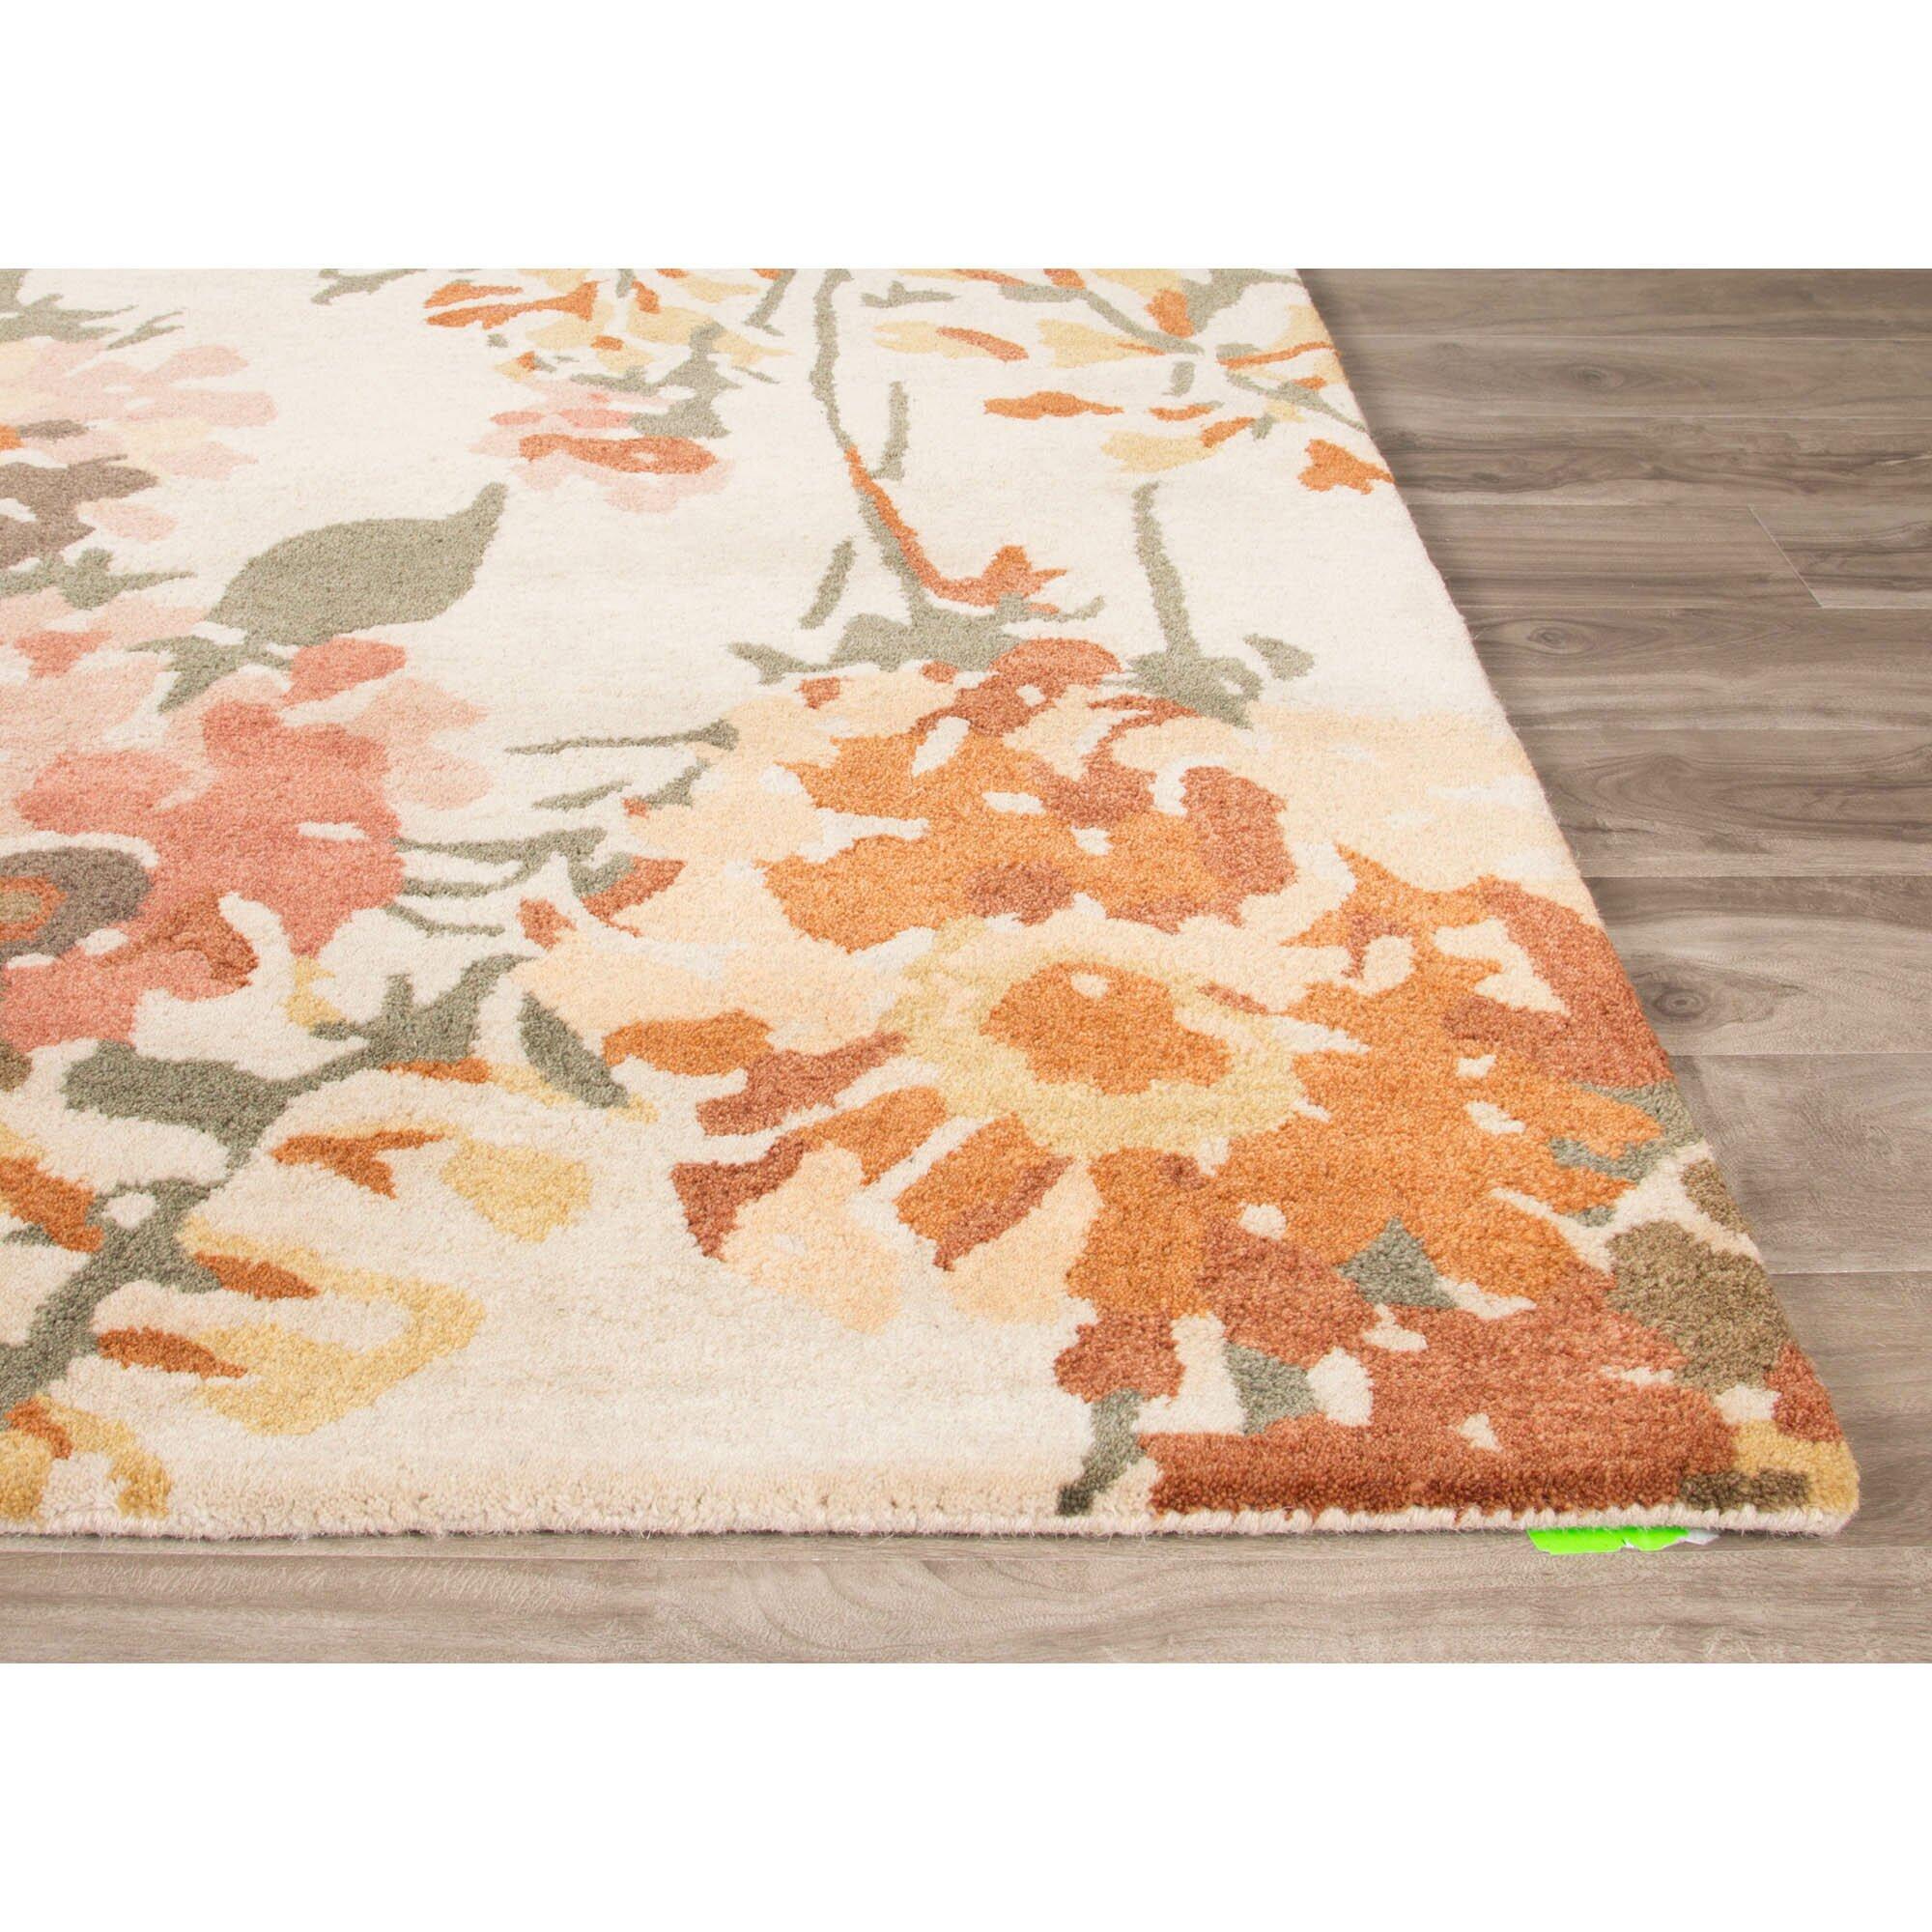 Area Rug 8x10 Orange: JaipurLiving En Casa Hand-Tufted Ivory/Orange Area Rug